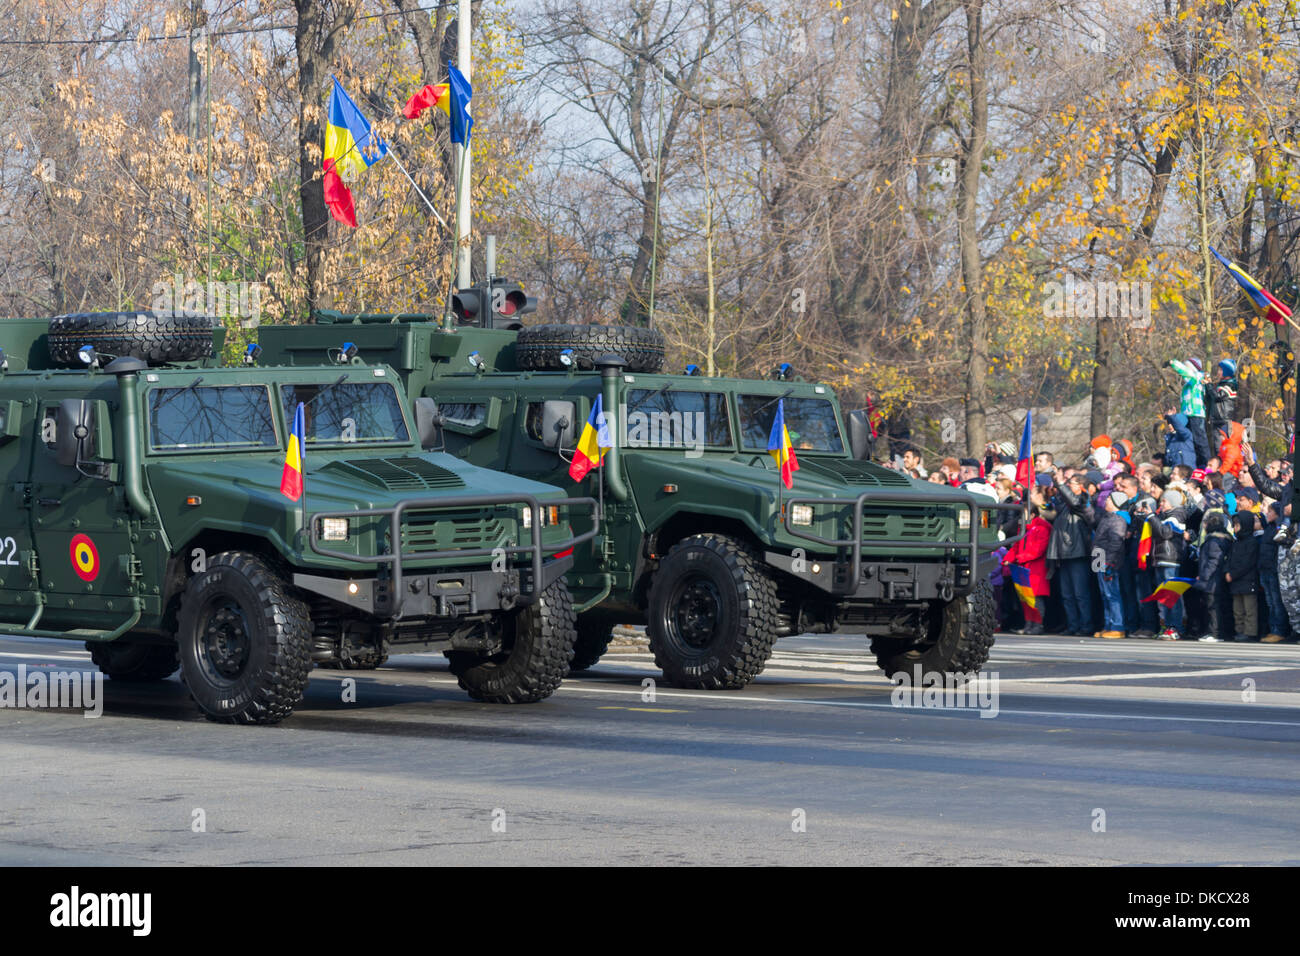 URO VAMTAC radio station vehicles - December 1st, Parade on Romania's National Day - Stock Image